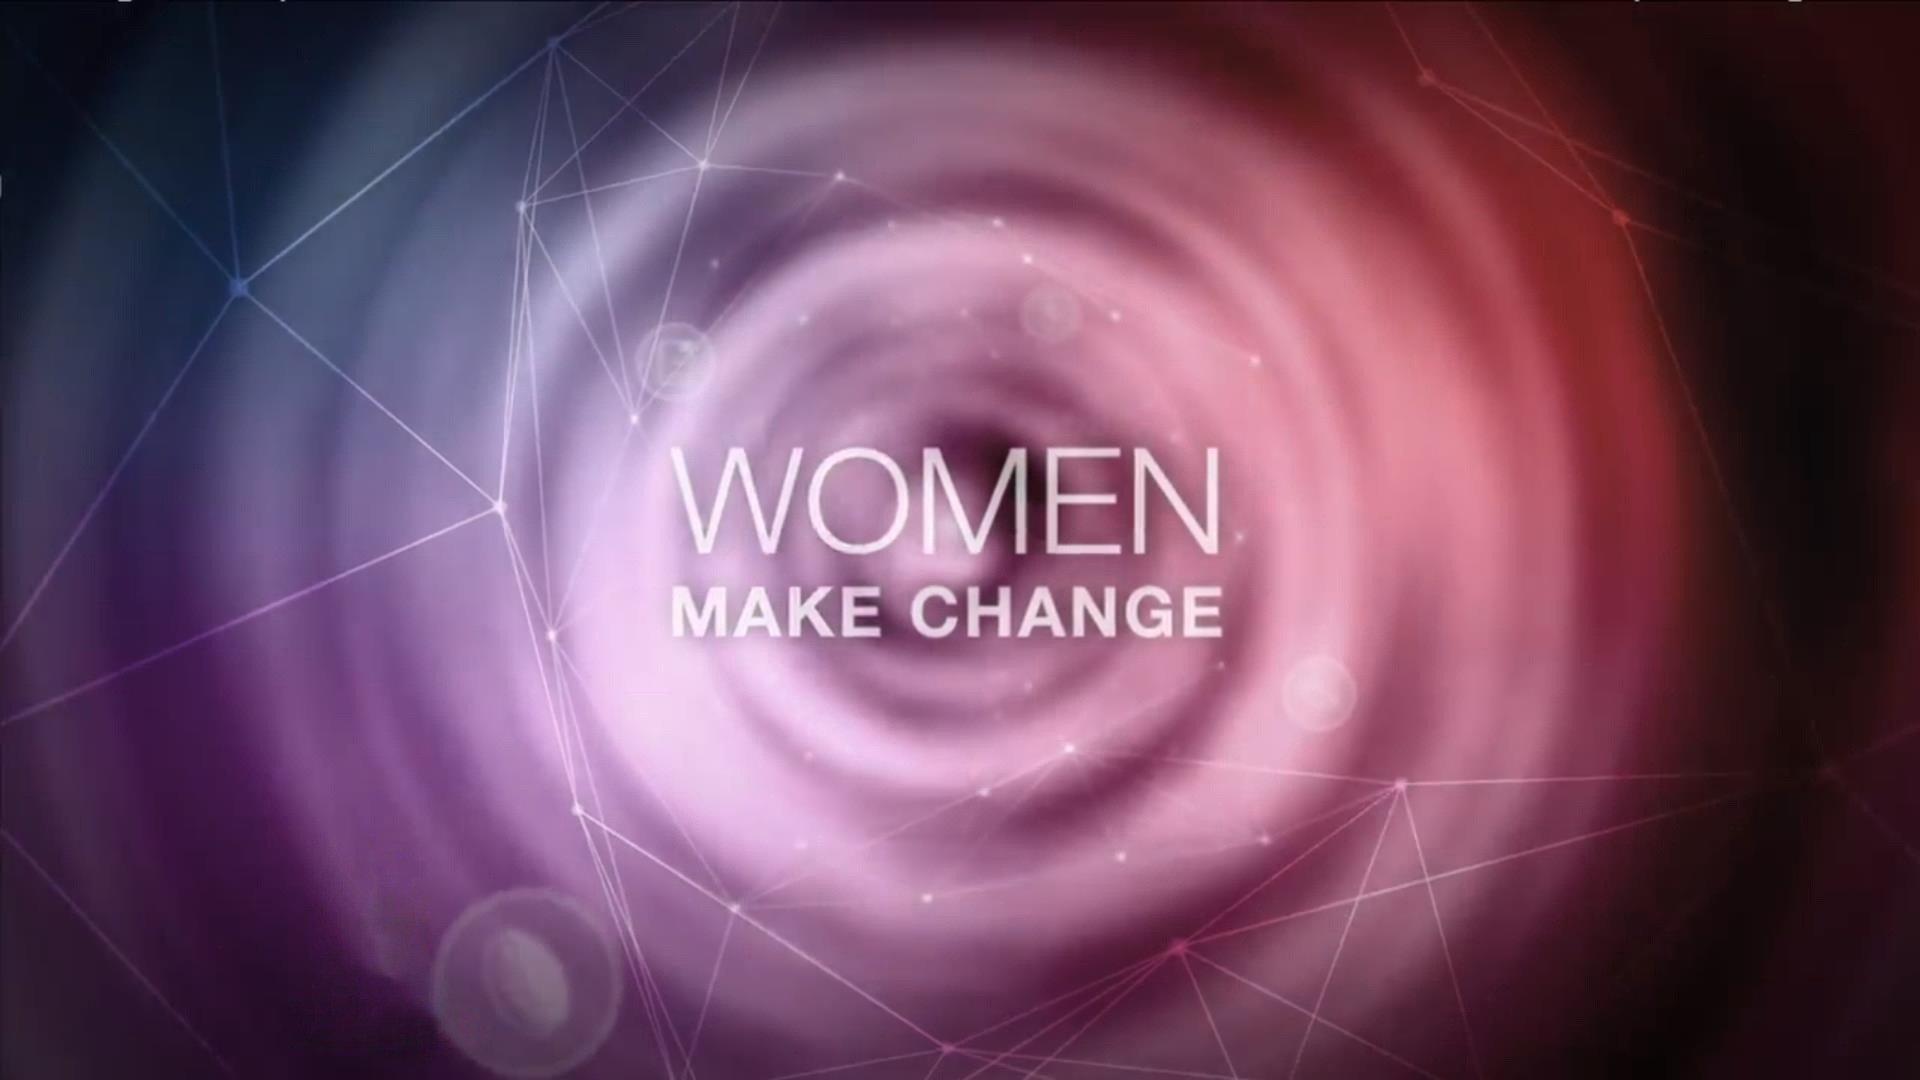 Women Make Change